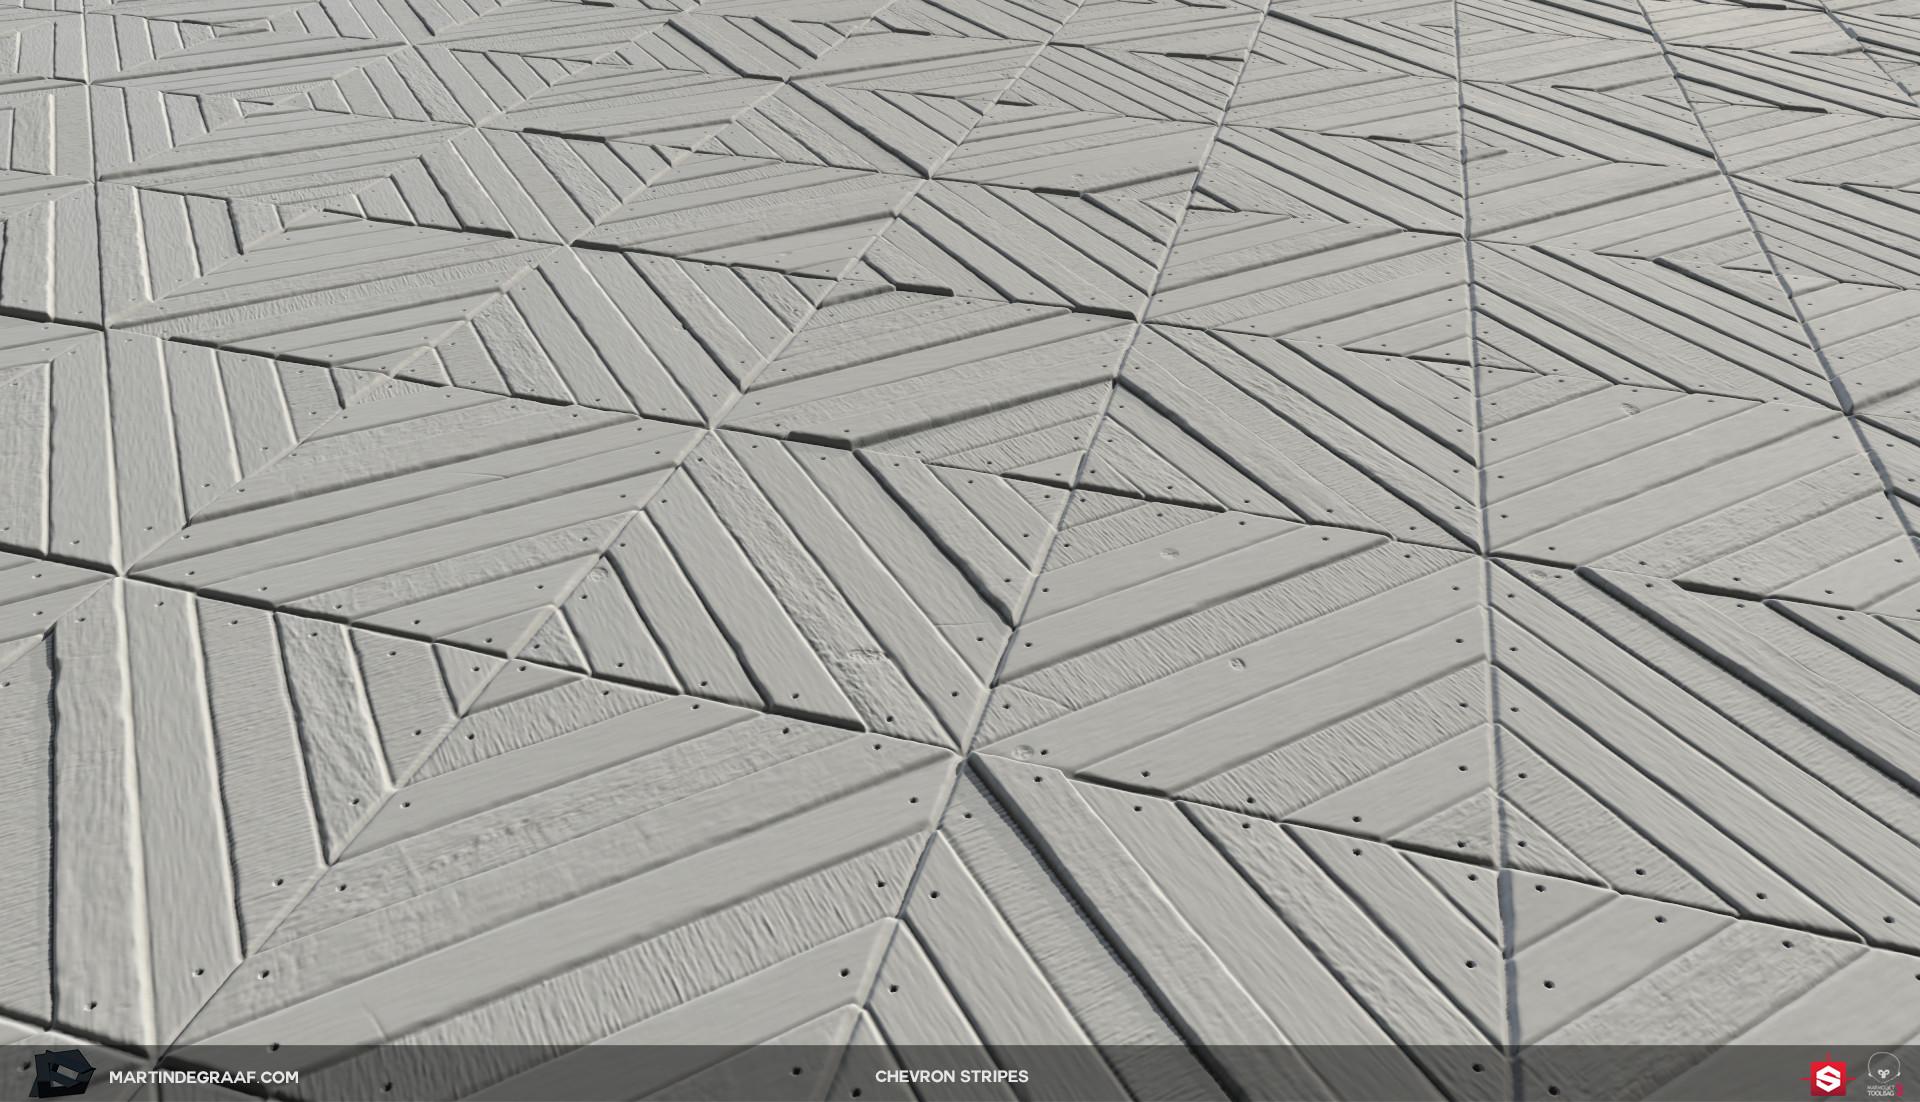 Martin de graaf chevron stripes substance plane gray martin de graaf 2018